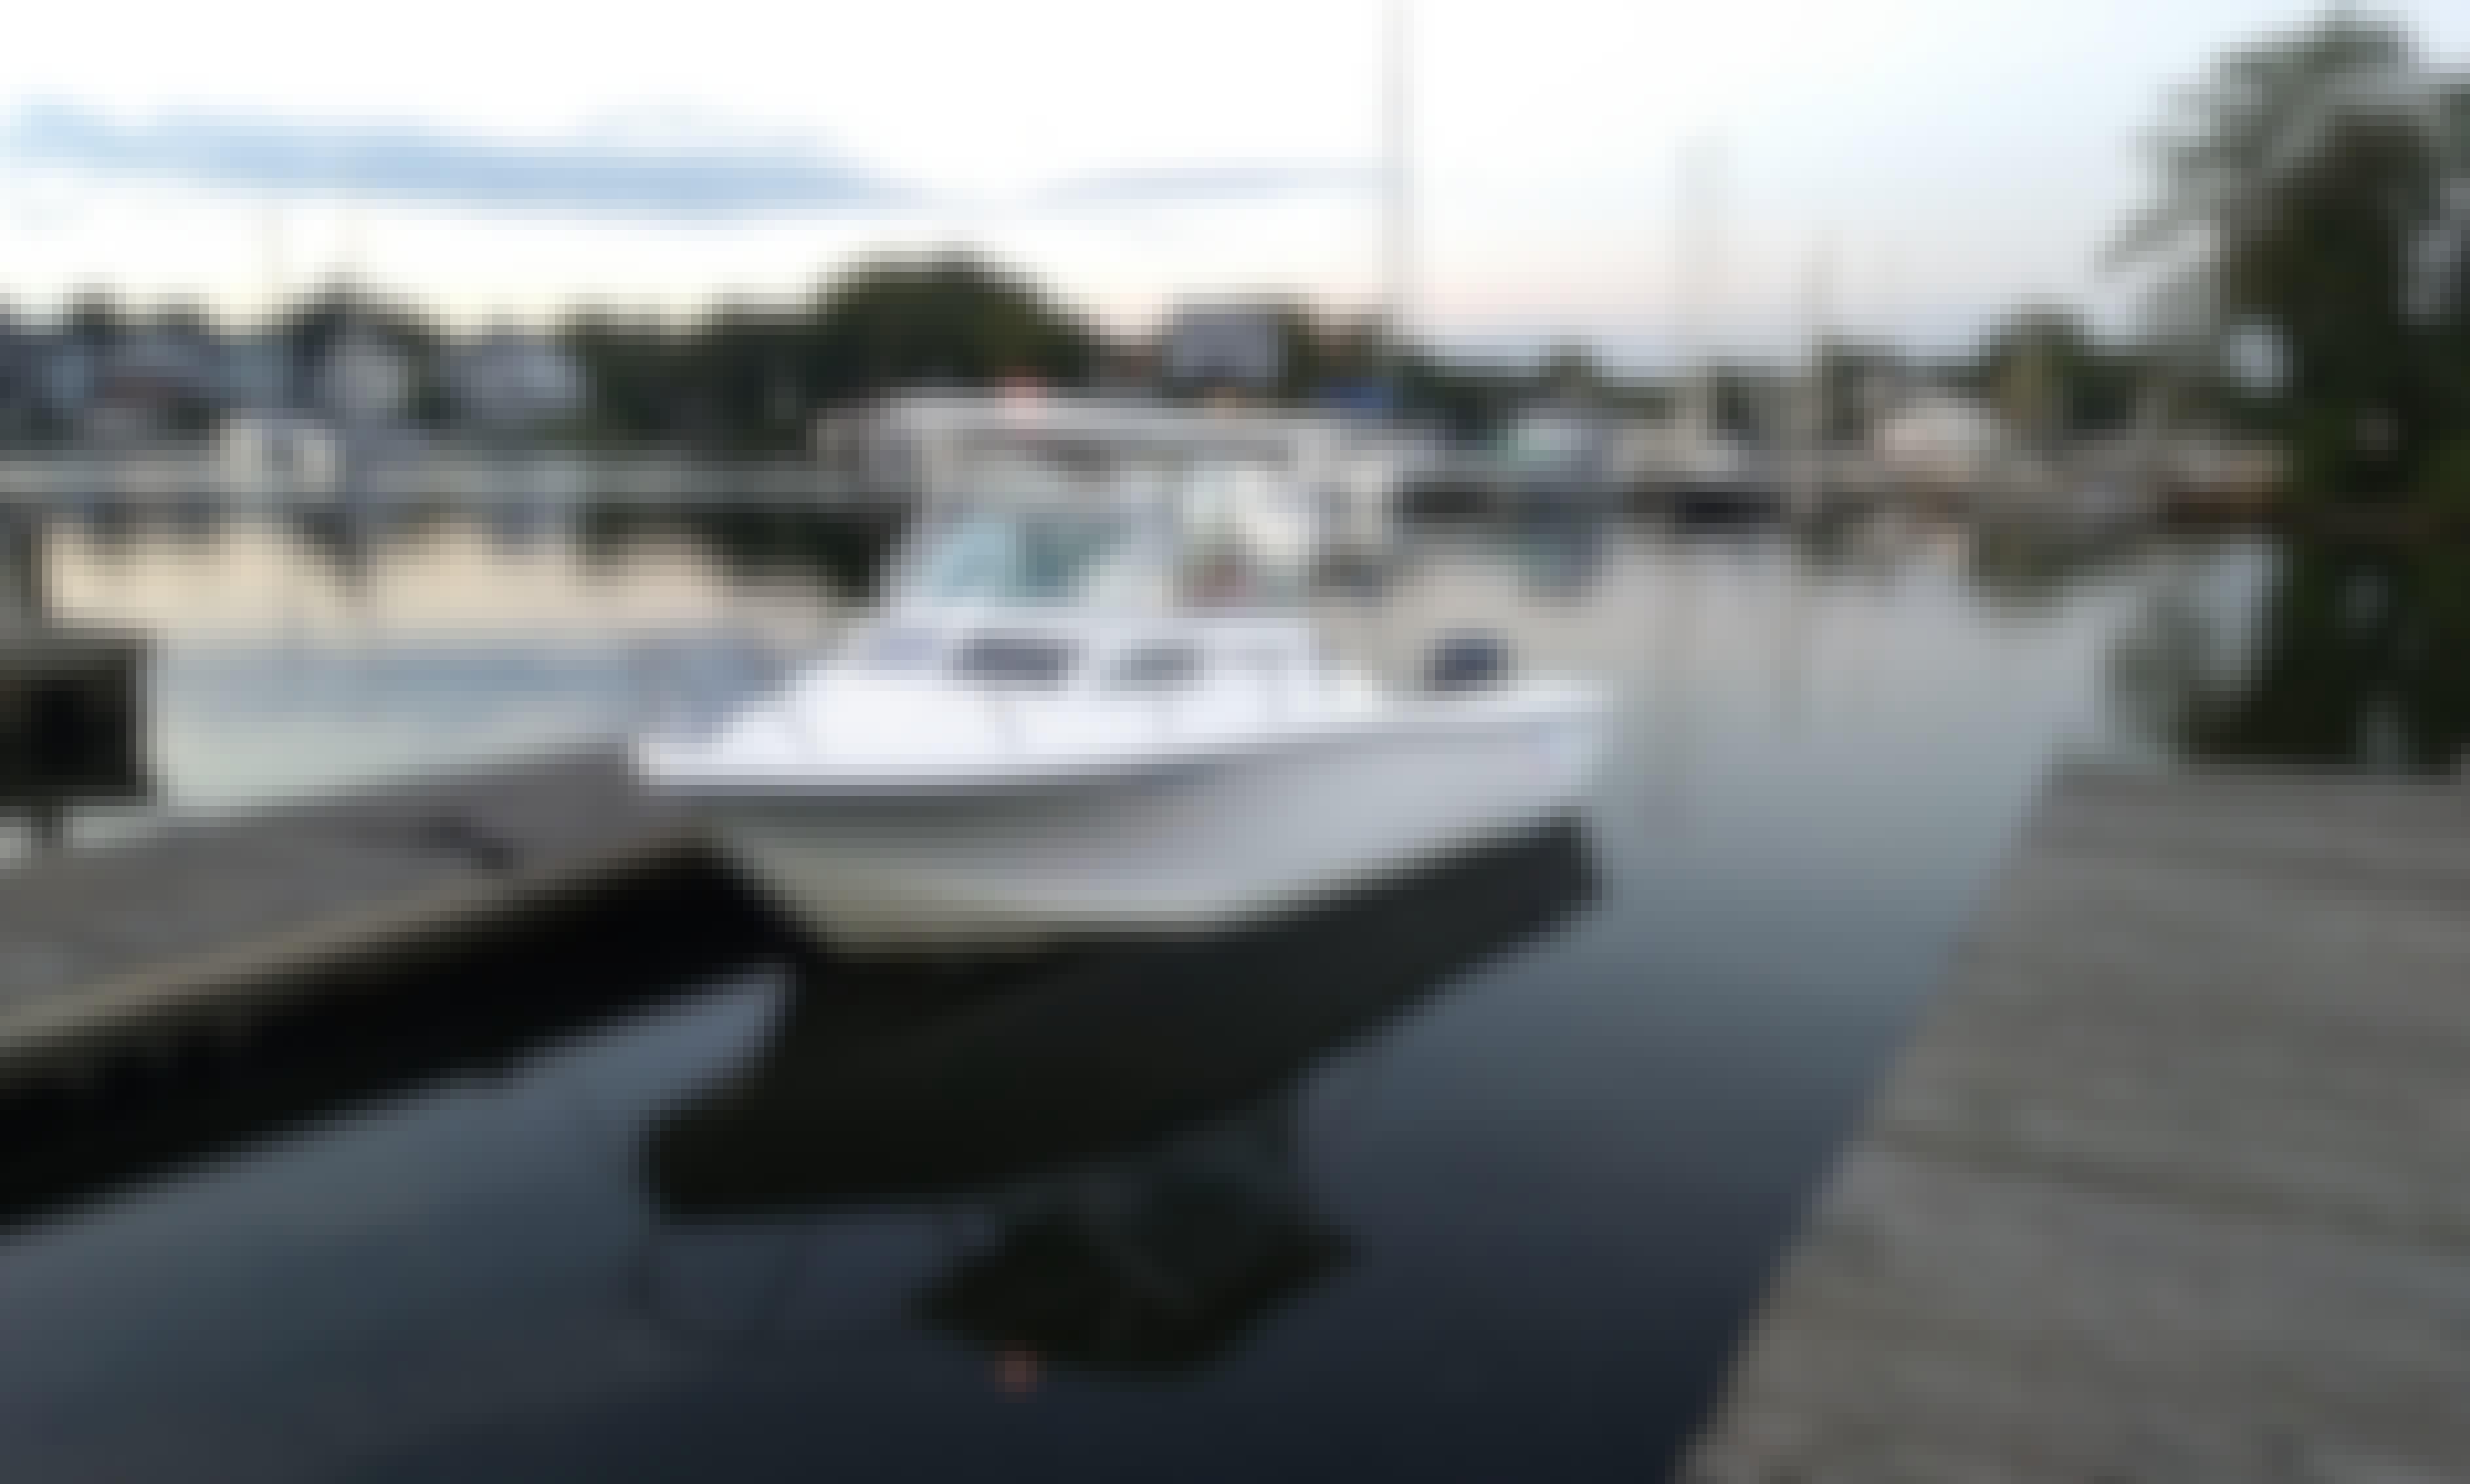 Cuddy Cabin/Walk Around fishing charter in Annapolis